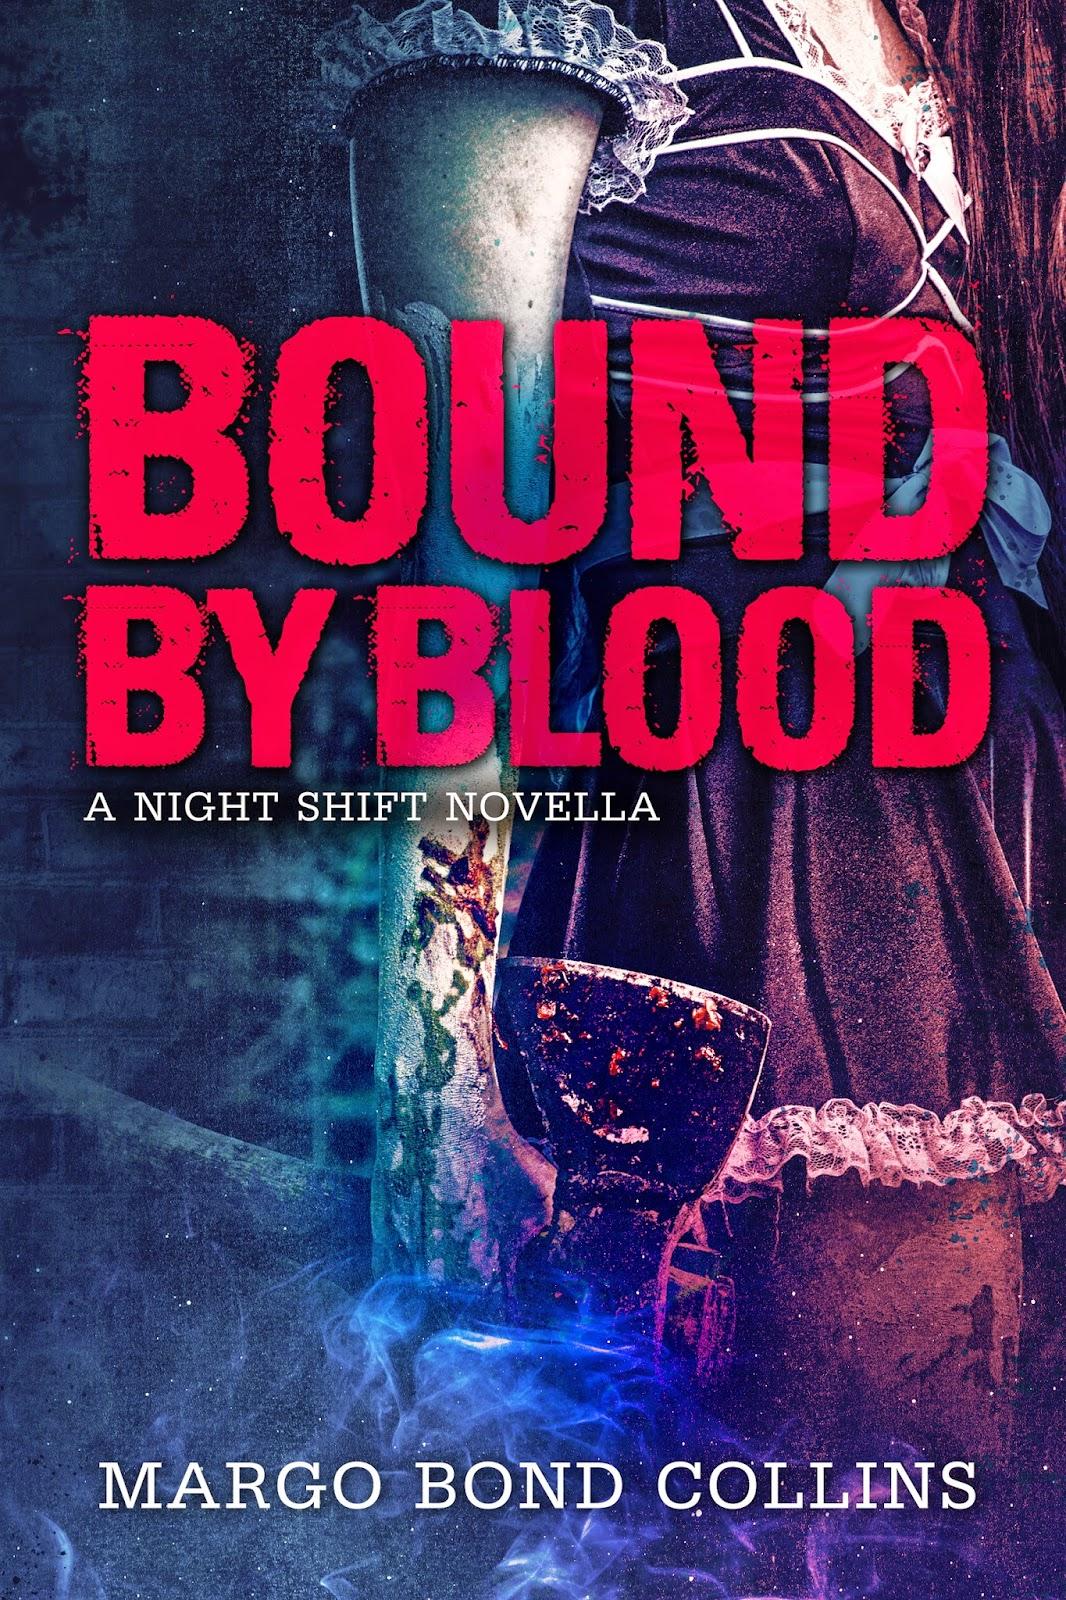 http://www.amazon.com/Bound-Blood-Night-Shift-Novella-ebook/dp/B00PB3AIGC/